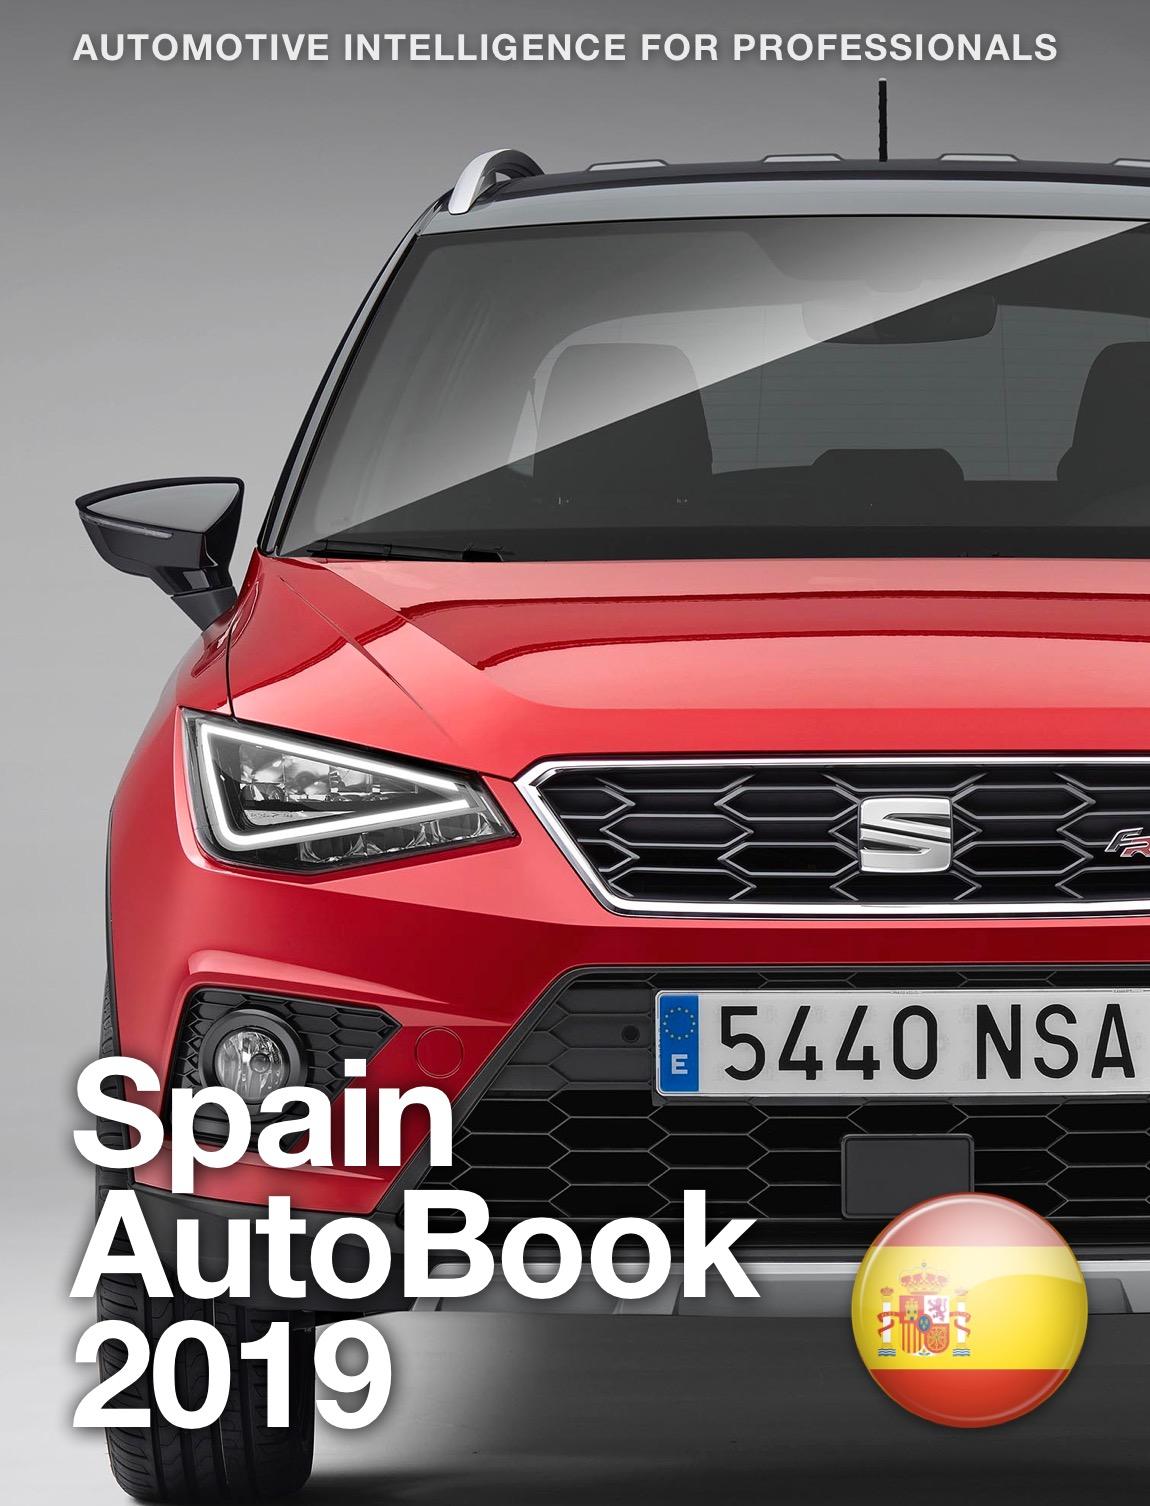 Spain AutoBook 2019 Cover.jpg